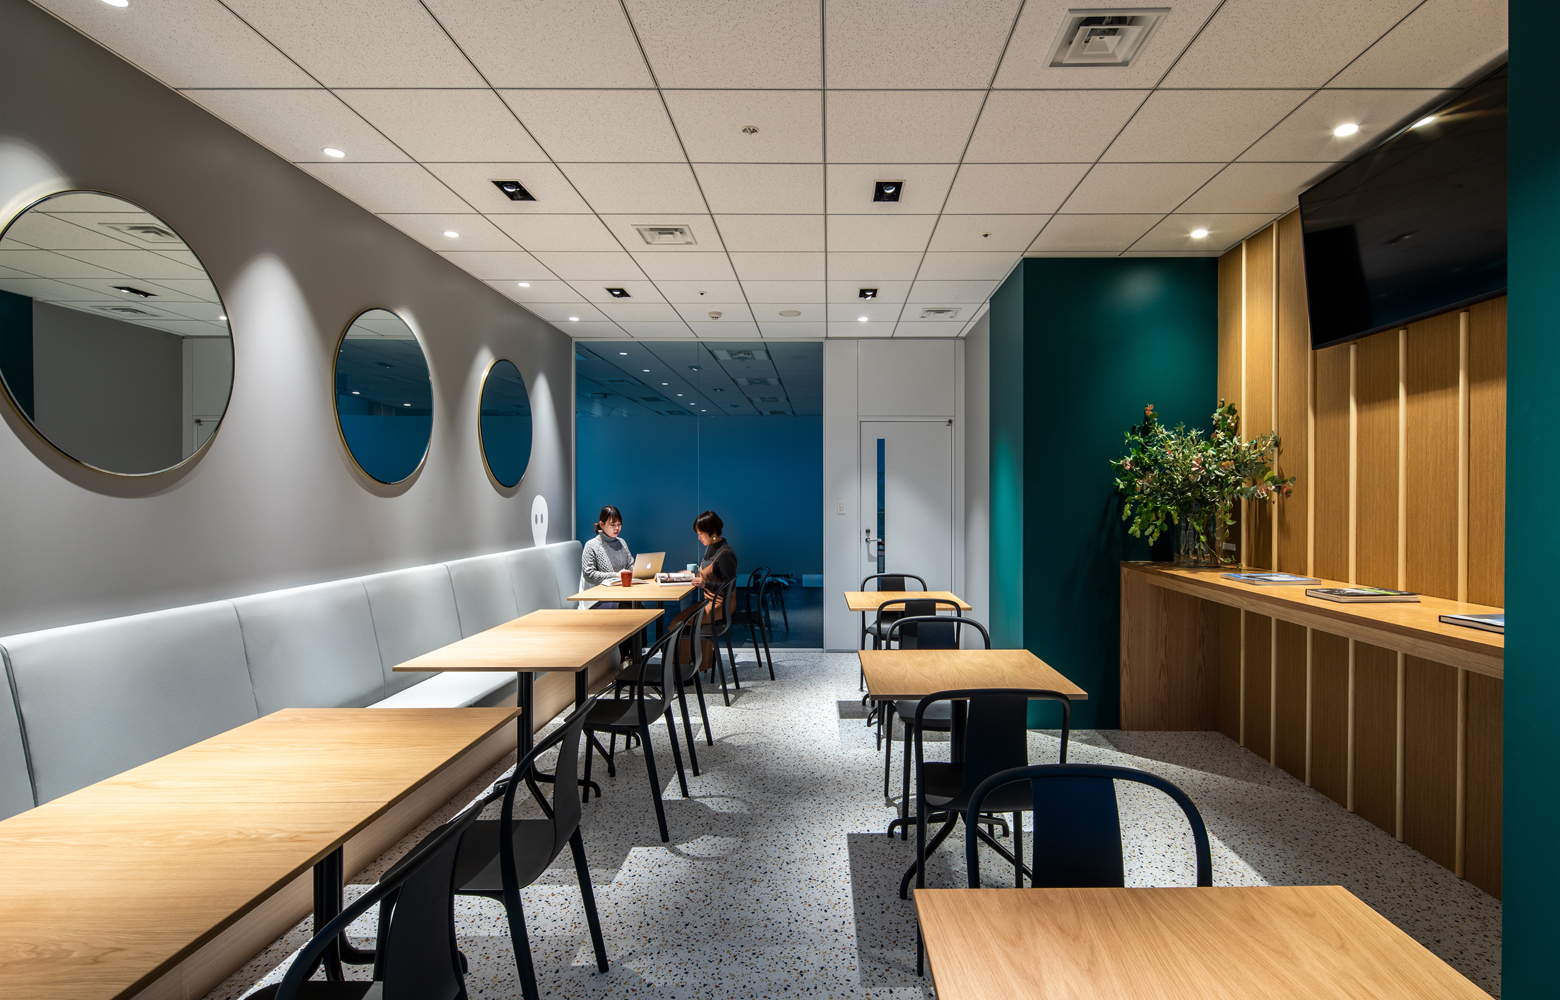 KLab株式会社 Roppongi Office Refresh Space_4 デザイン・レイアウト事例